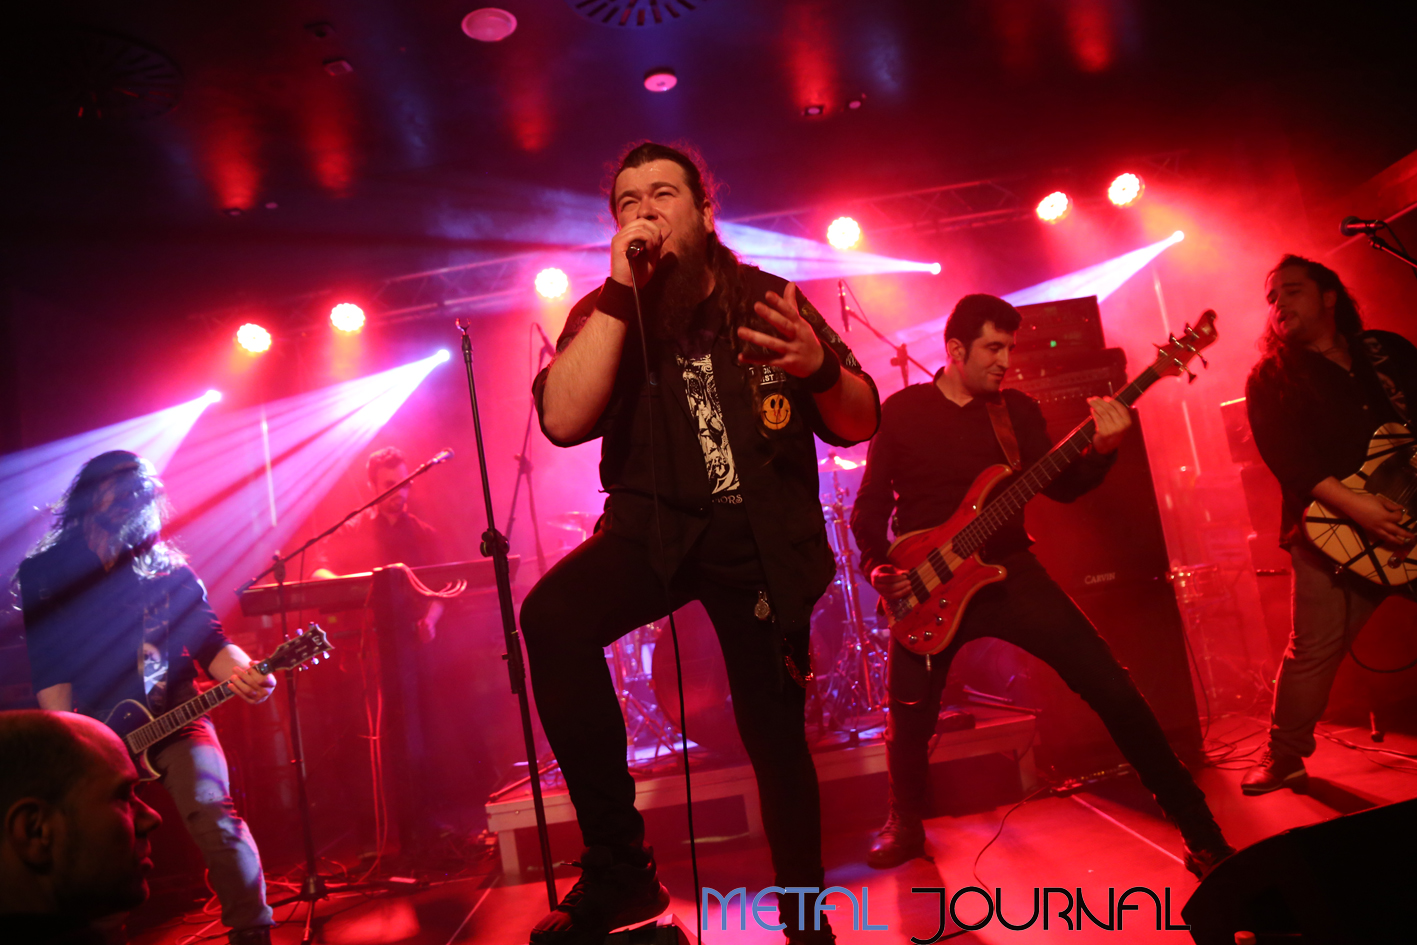 olvido 2018 - metal journal pic 1